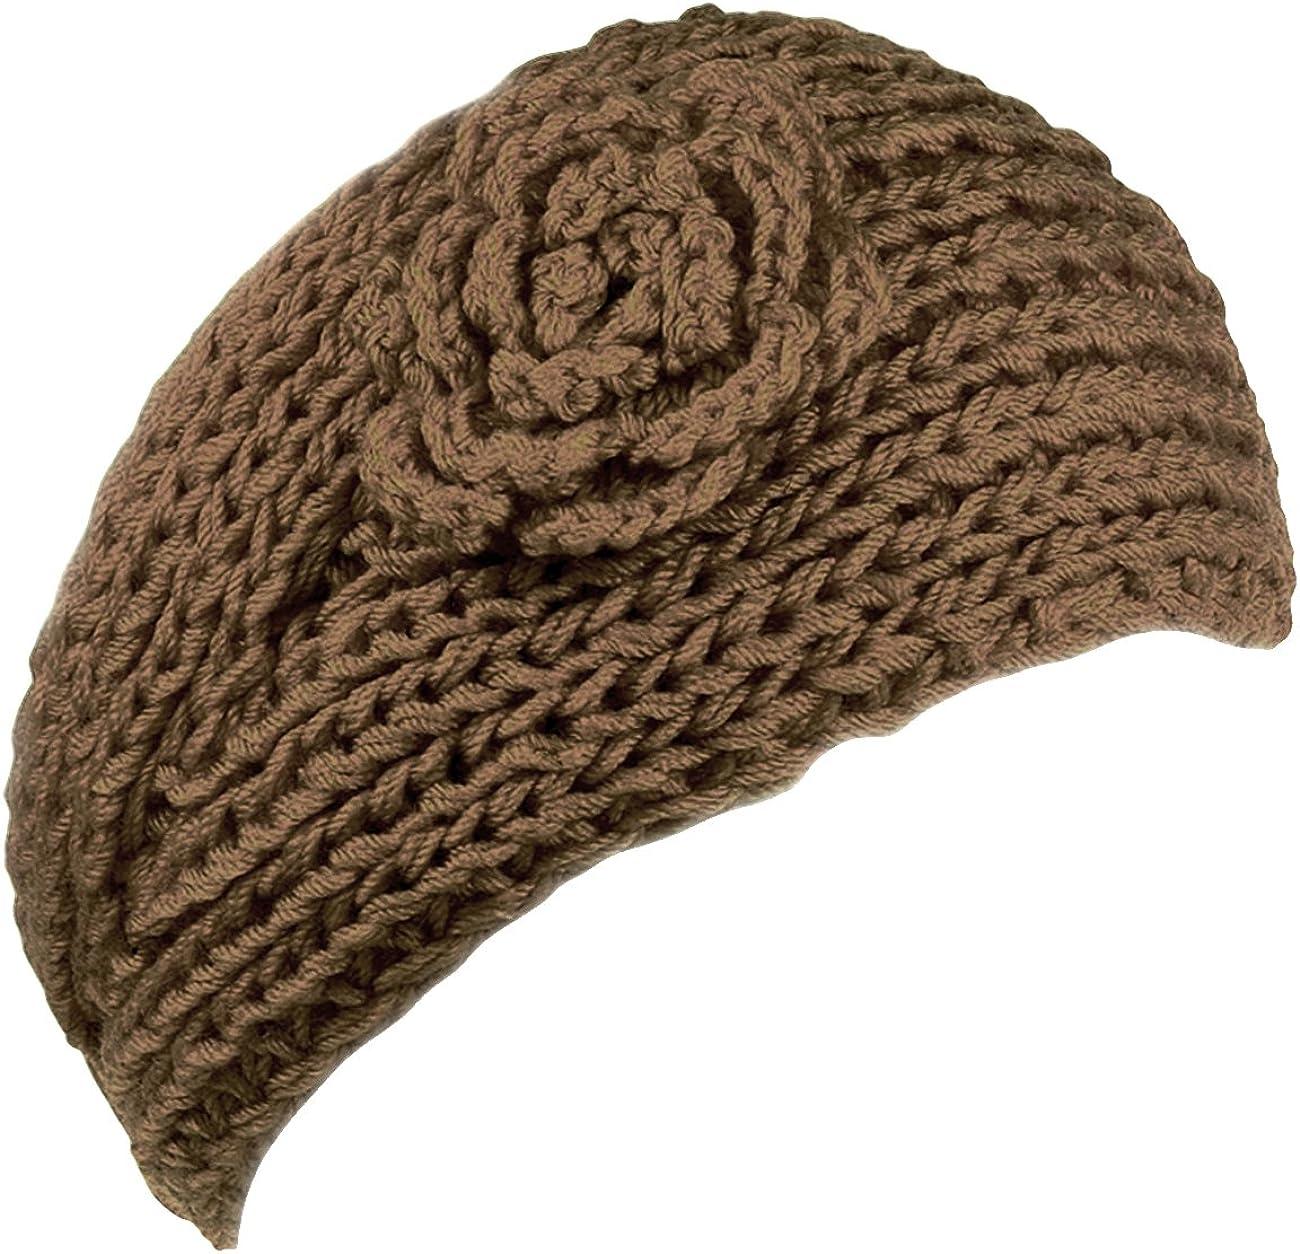 KMystic Knit Winter Headband with Flower